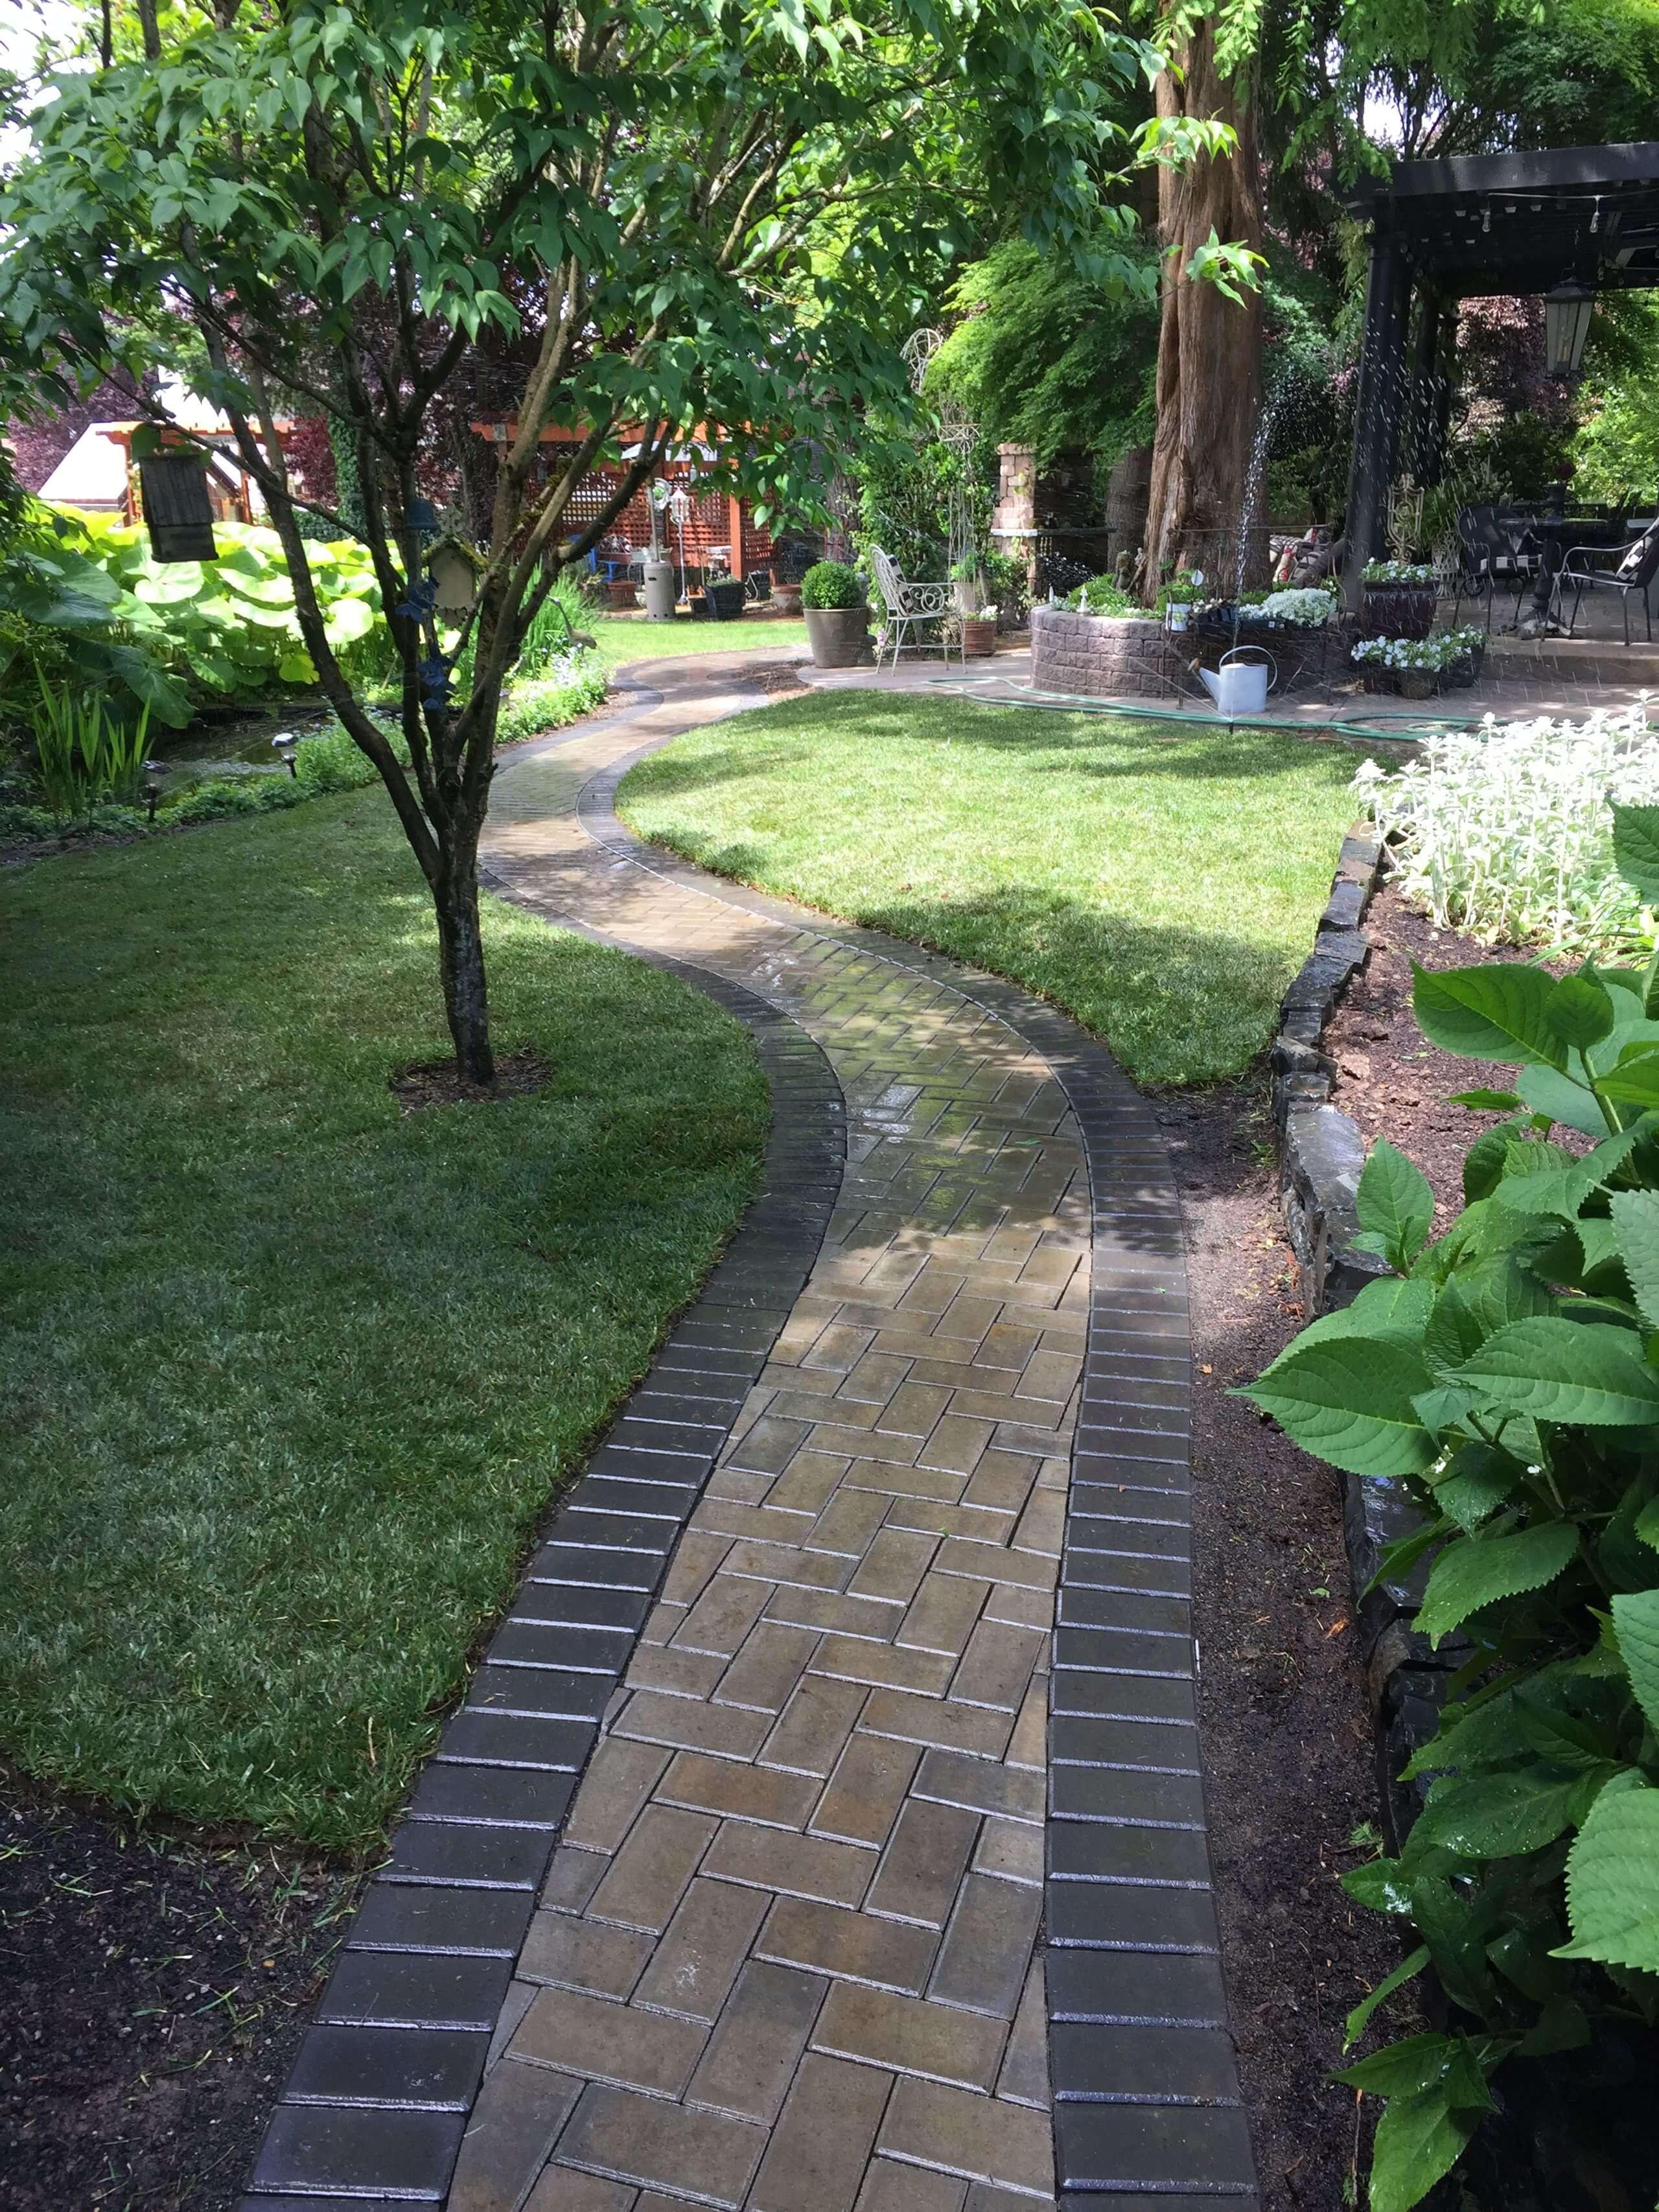 https://shovelandthumb.sfo3.digitaloceanspaces.com/patios walkways/walkway 11